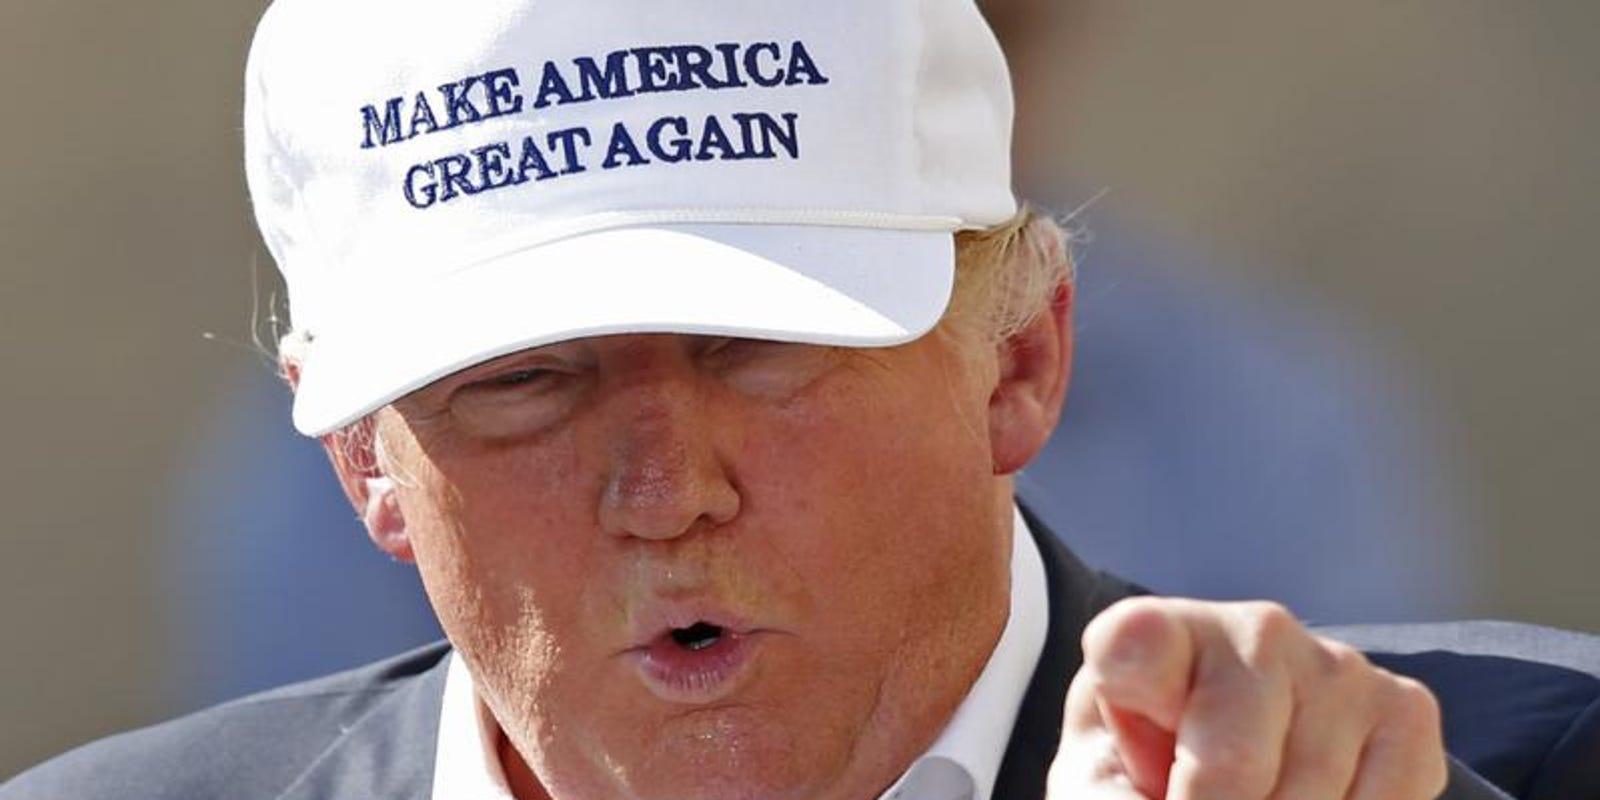 Trump S Make America Great Again Target Of Minority Satire